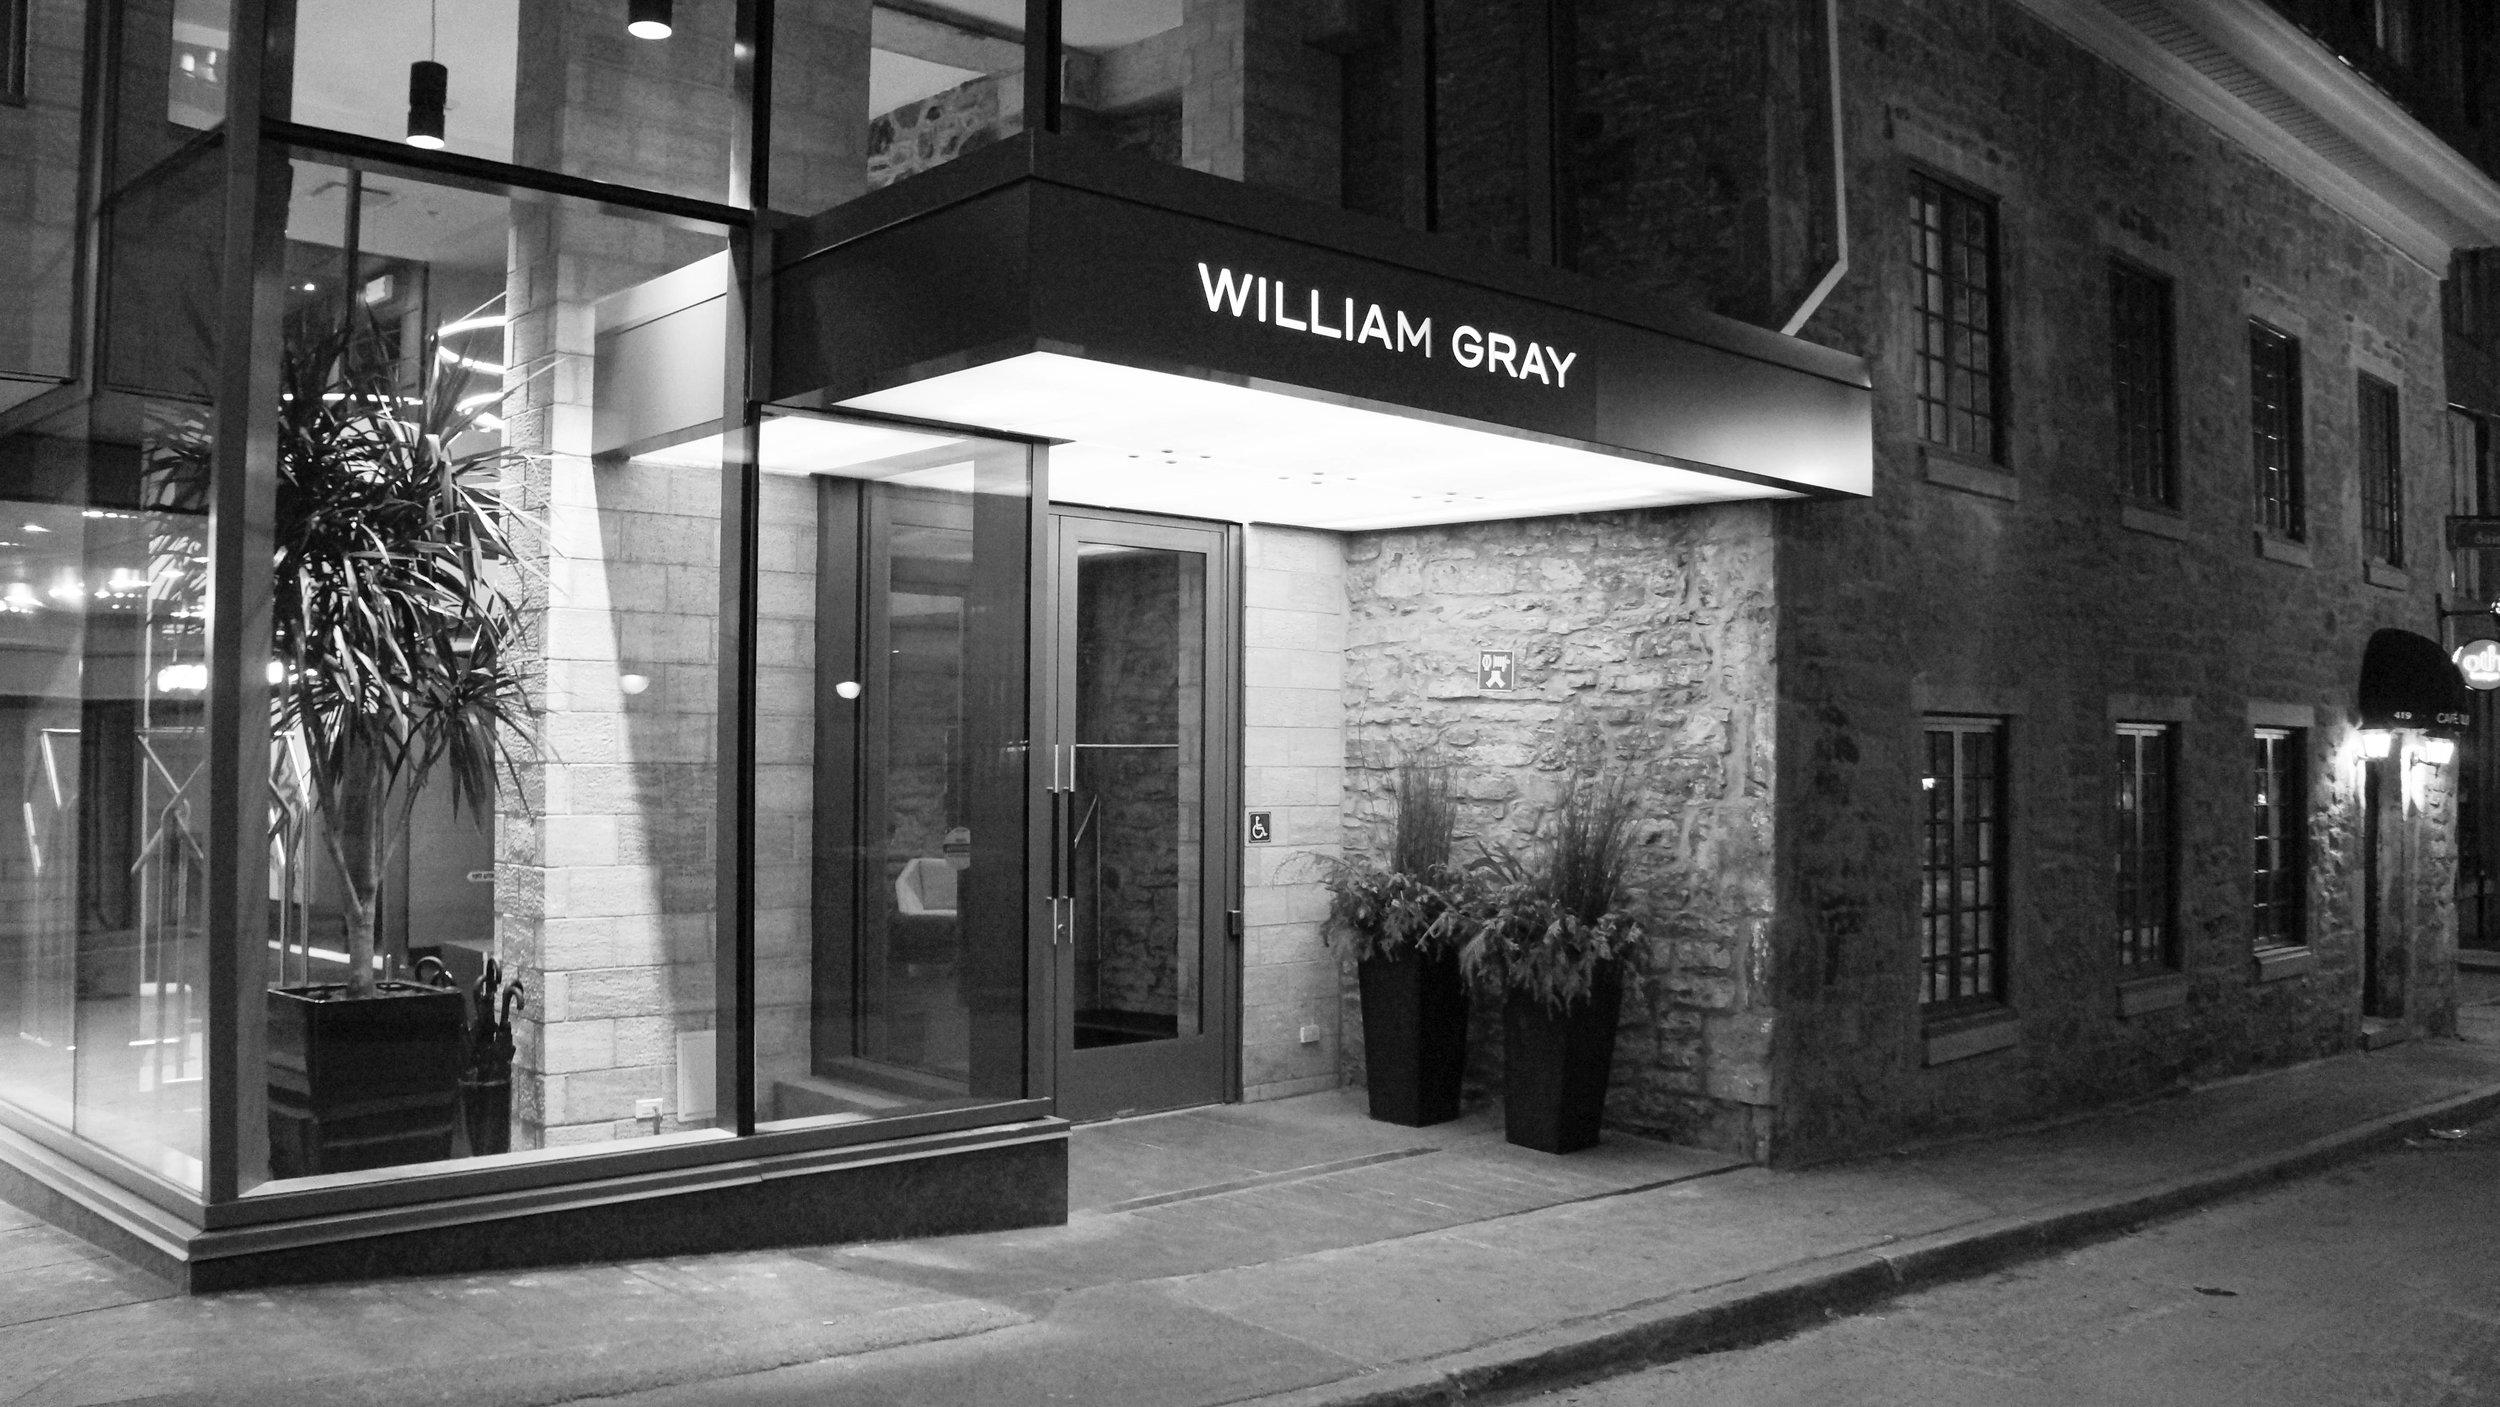 HOTEL WILLIAM GRAY  MONTREALS NEWEST BOUTIQUE HOTEL